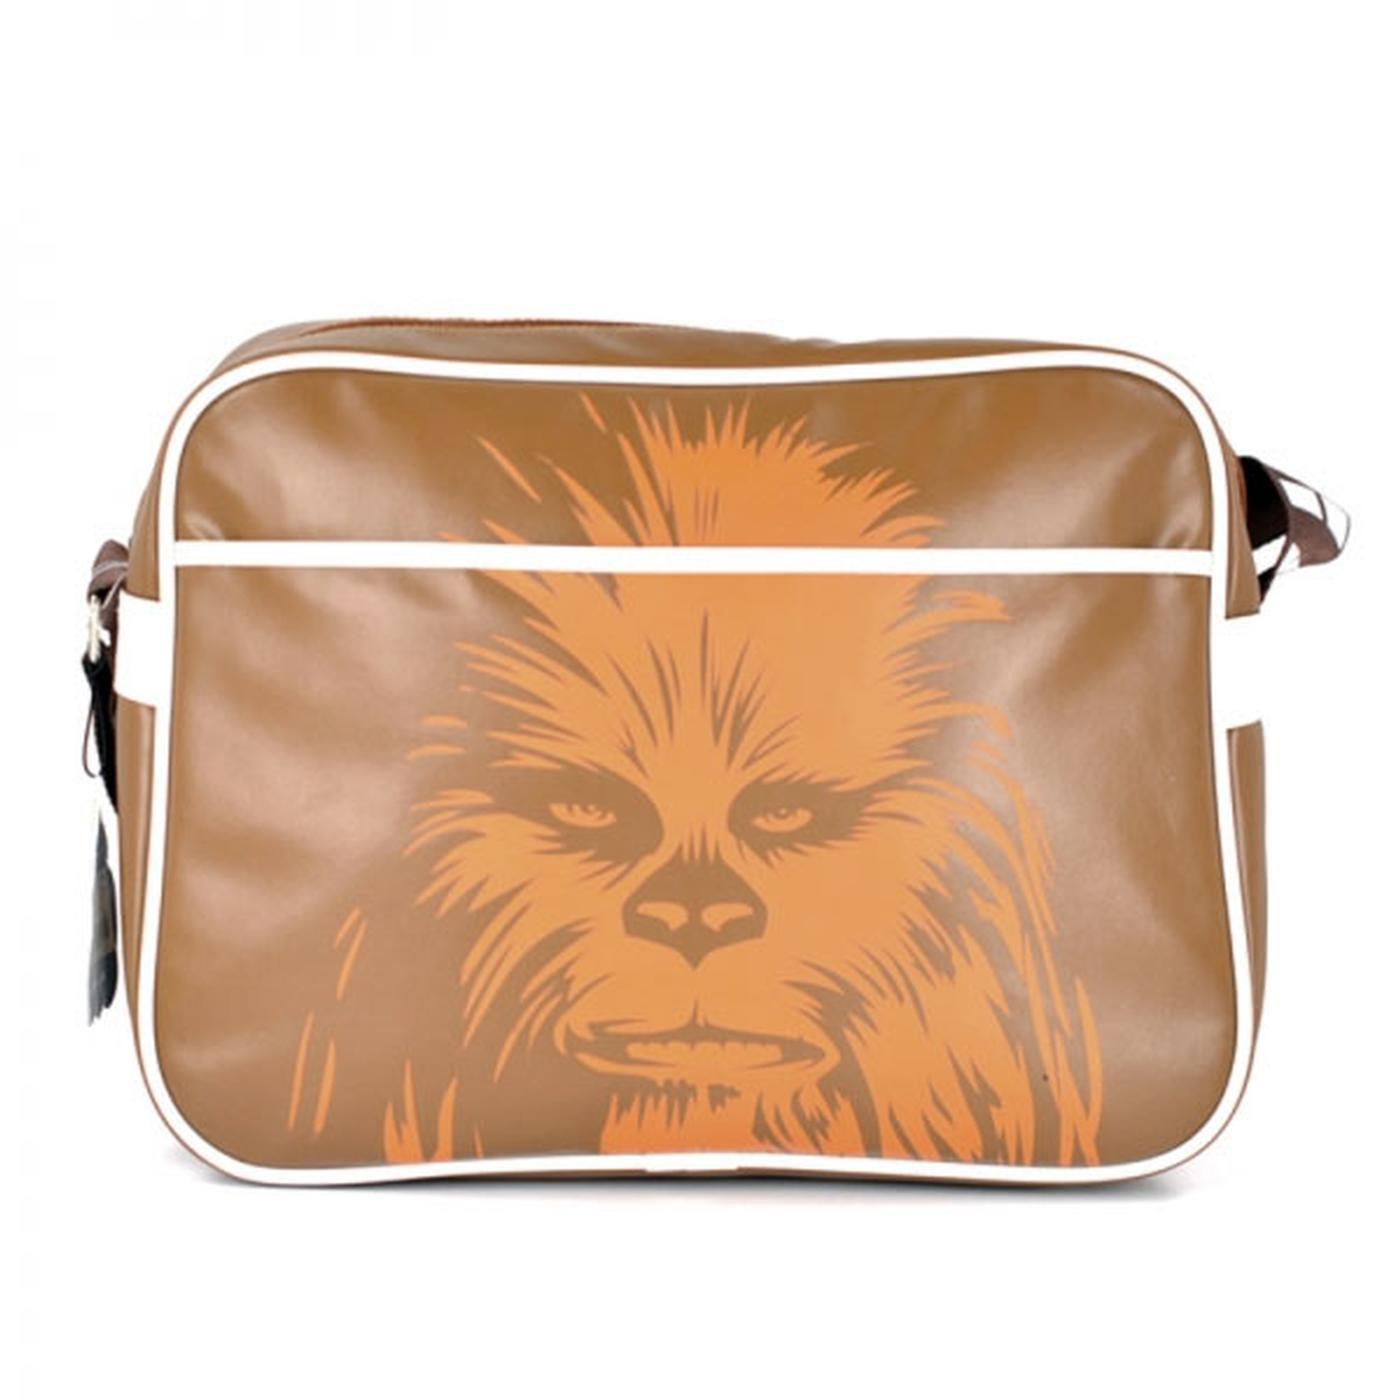 Star Wars Chewbacca Print Retro Shoulder Bag